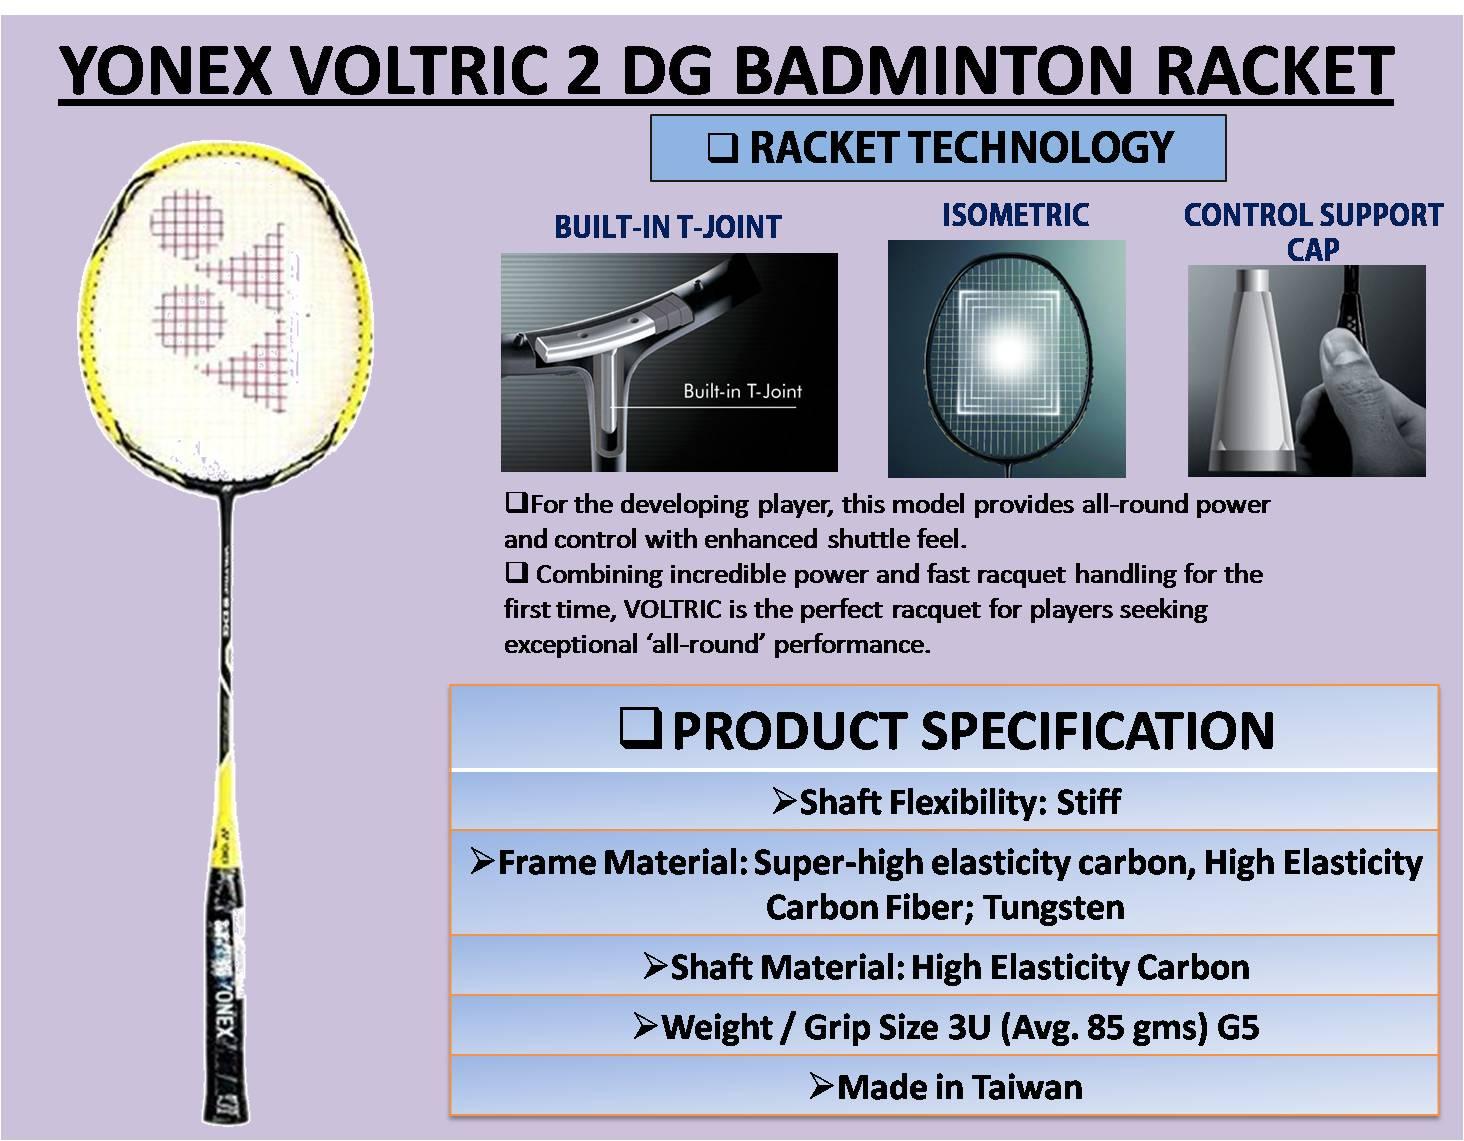 YONEX VOLTRIC 2 DG BADMINTON RACKET